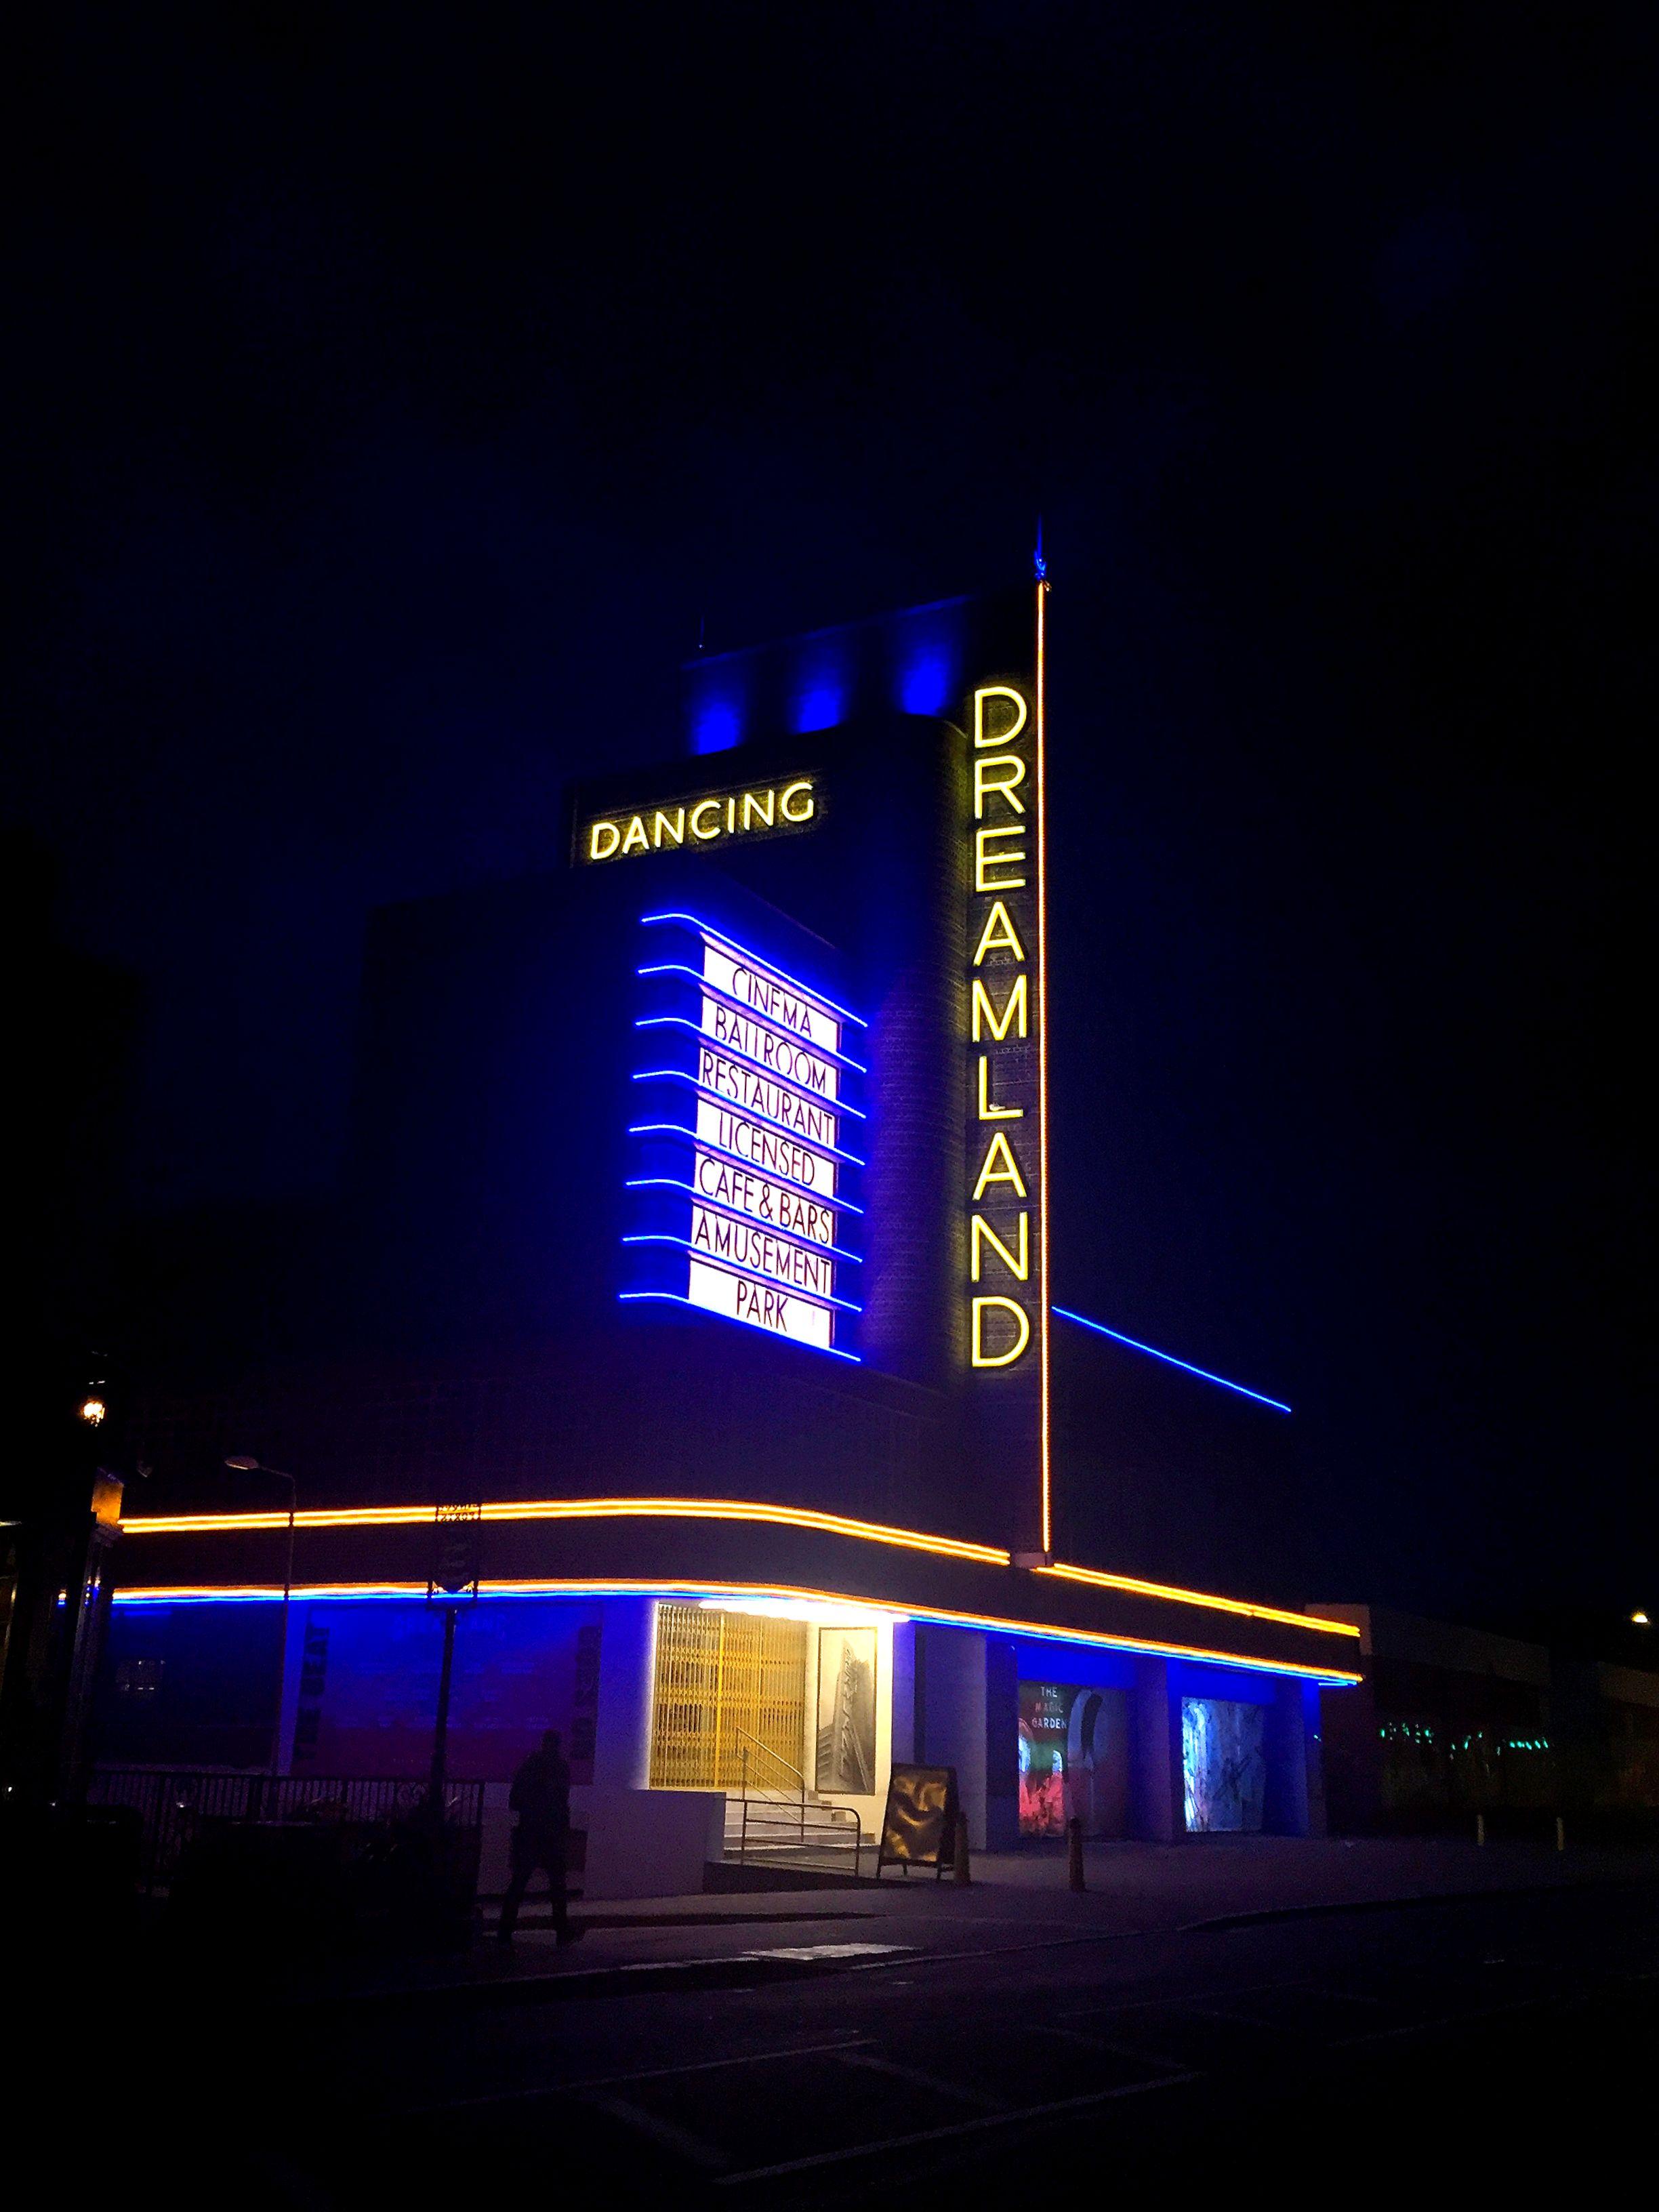 Margate Dreamland - retro neon, vintage seaside town